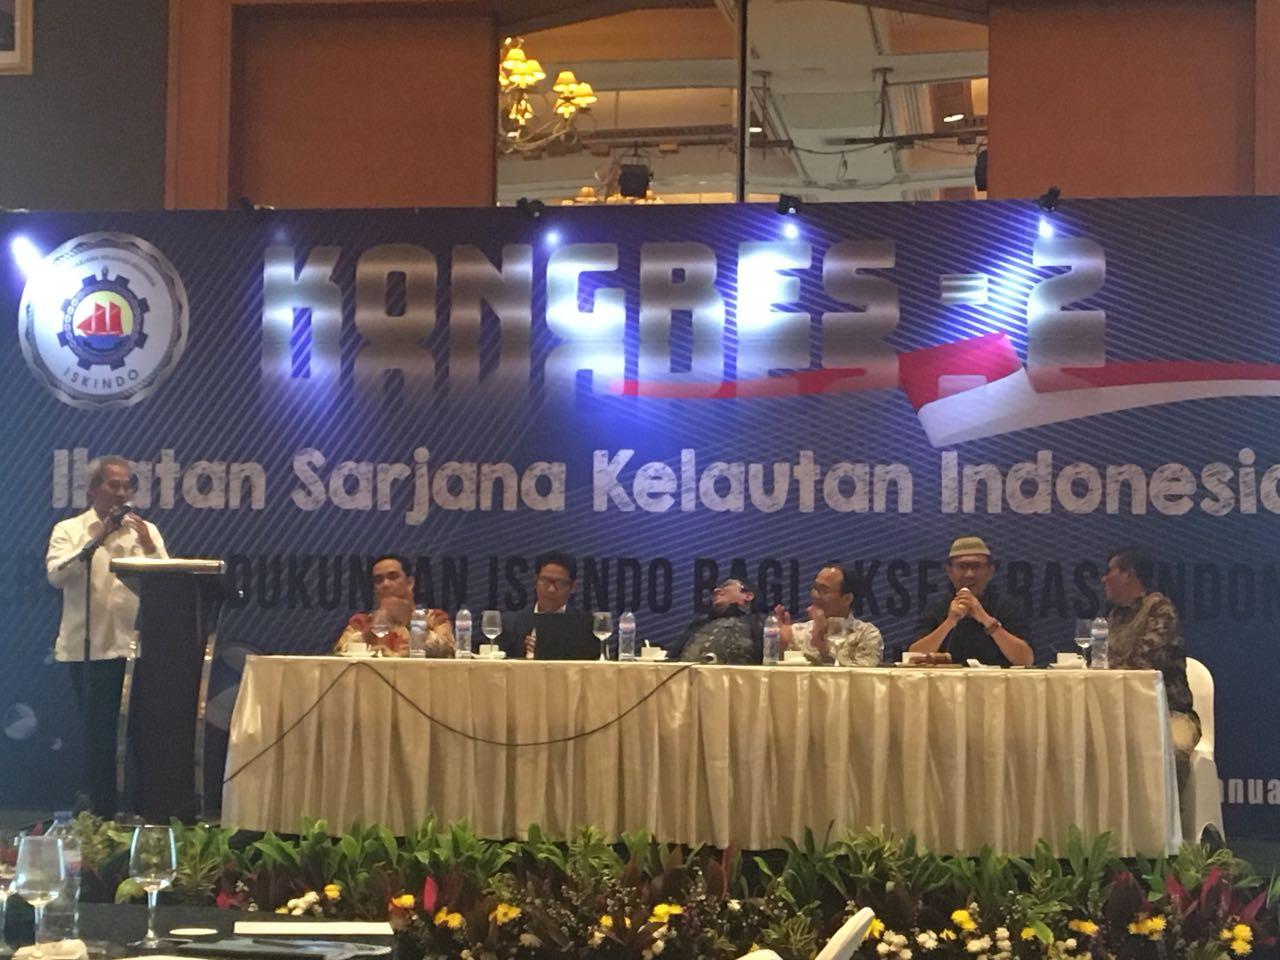 Ribuan Sarjana Kelautan Akselerasi Indonesia Sebagai Poros Maritim Dunia